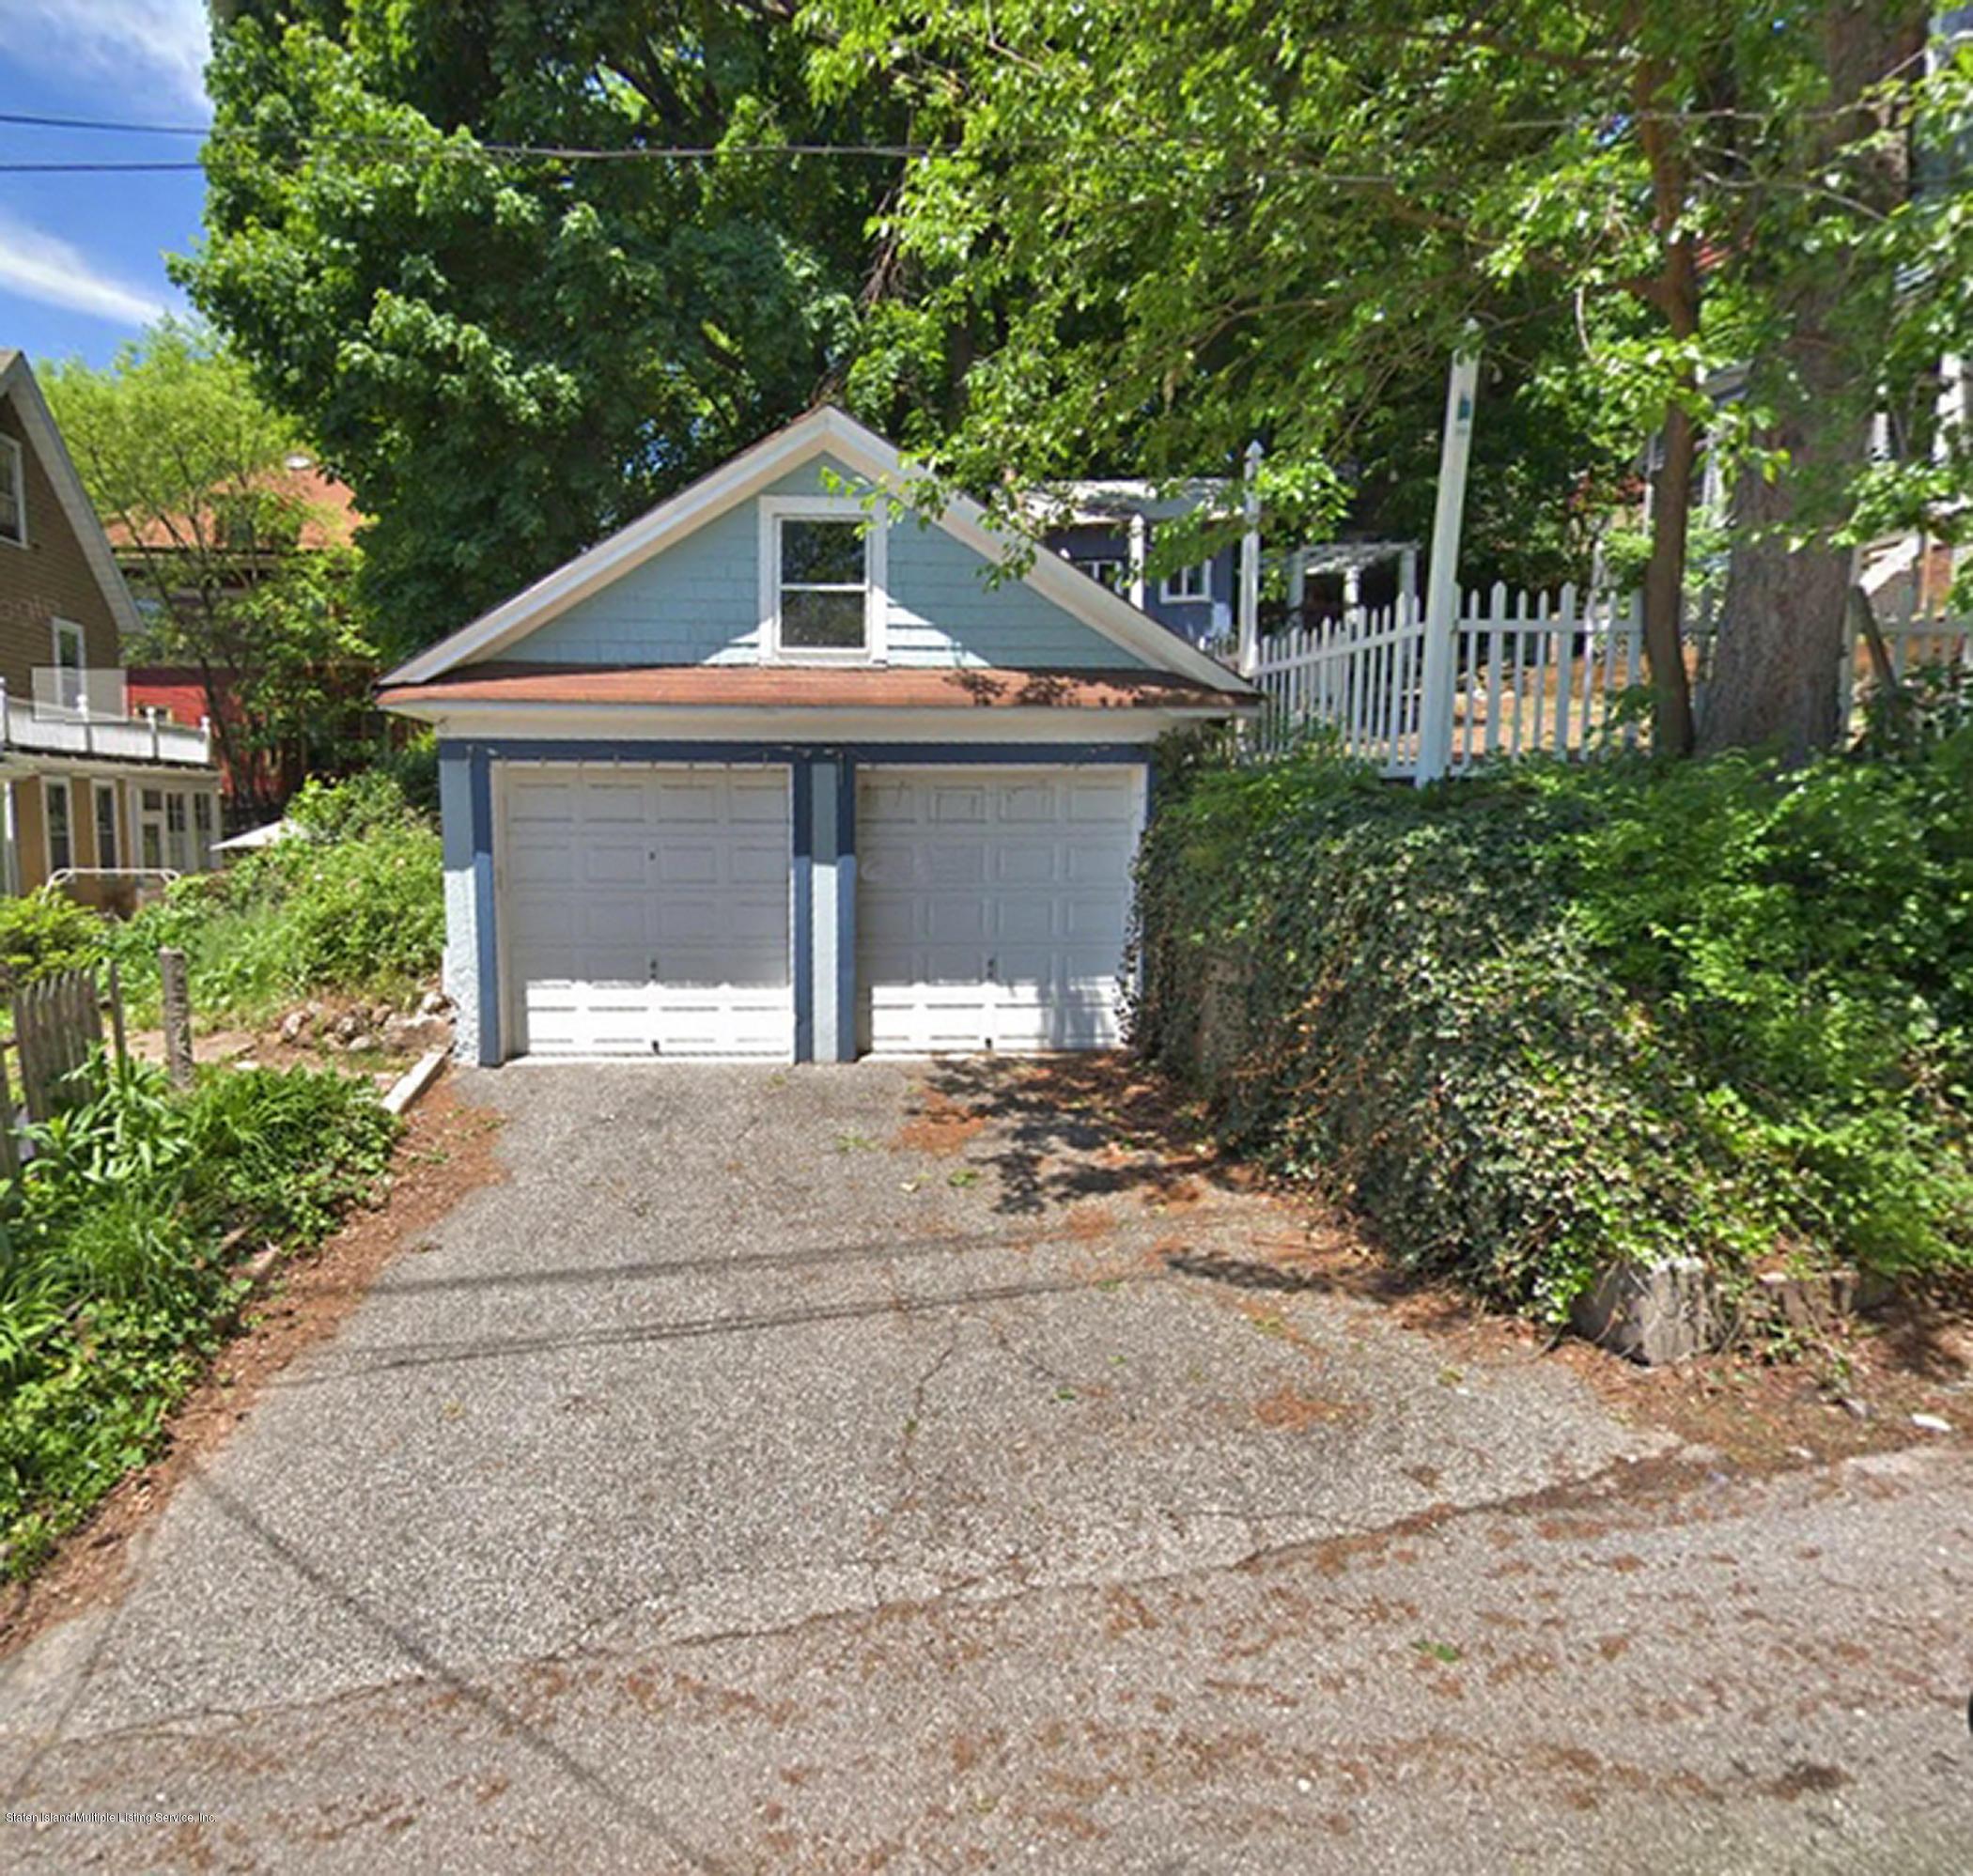 Two Family - Detached 175 Cebra Avenue  Staten Island, NY 10304, MLS-1140817-17